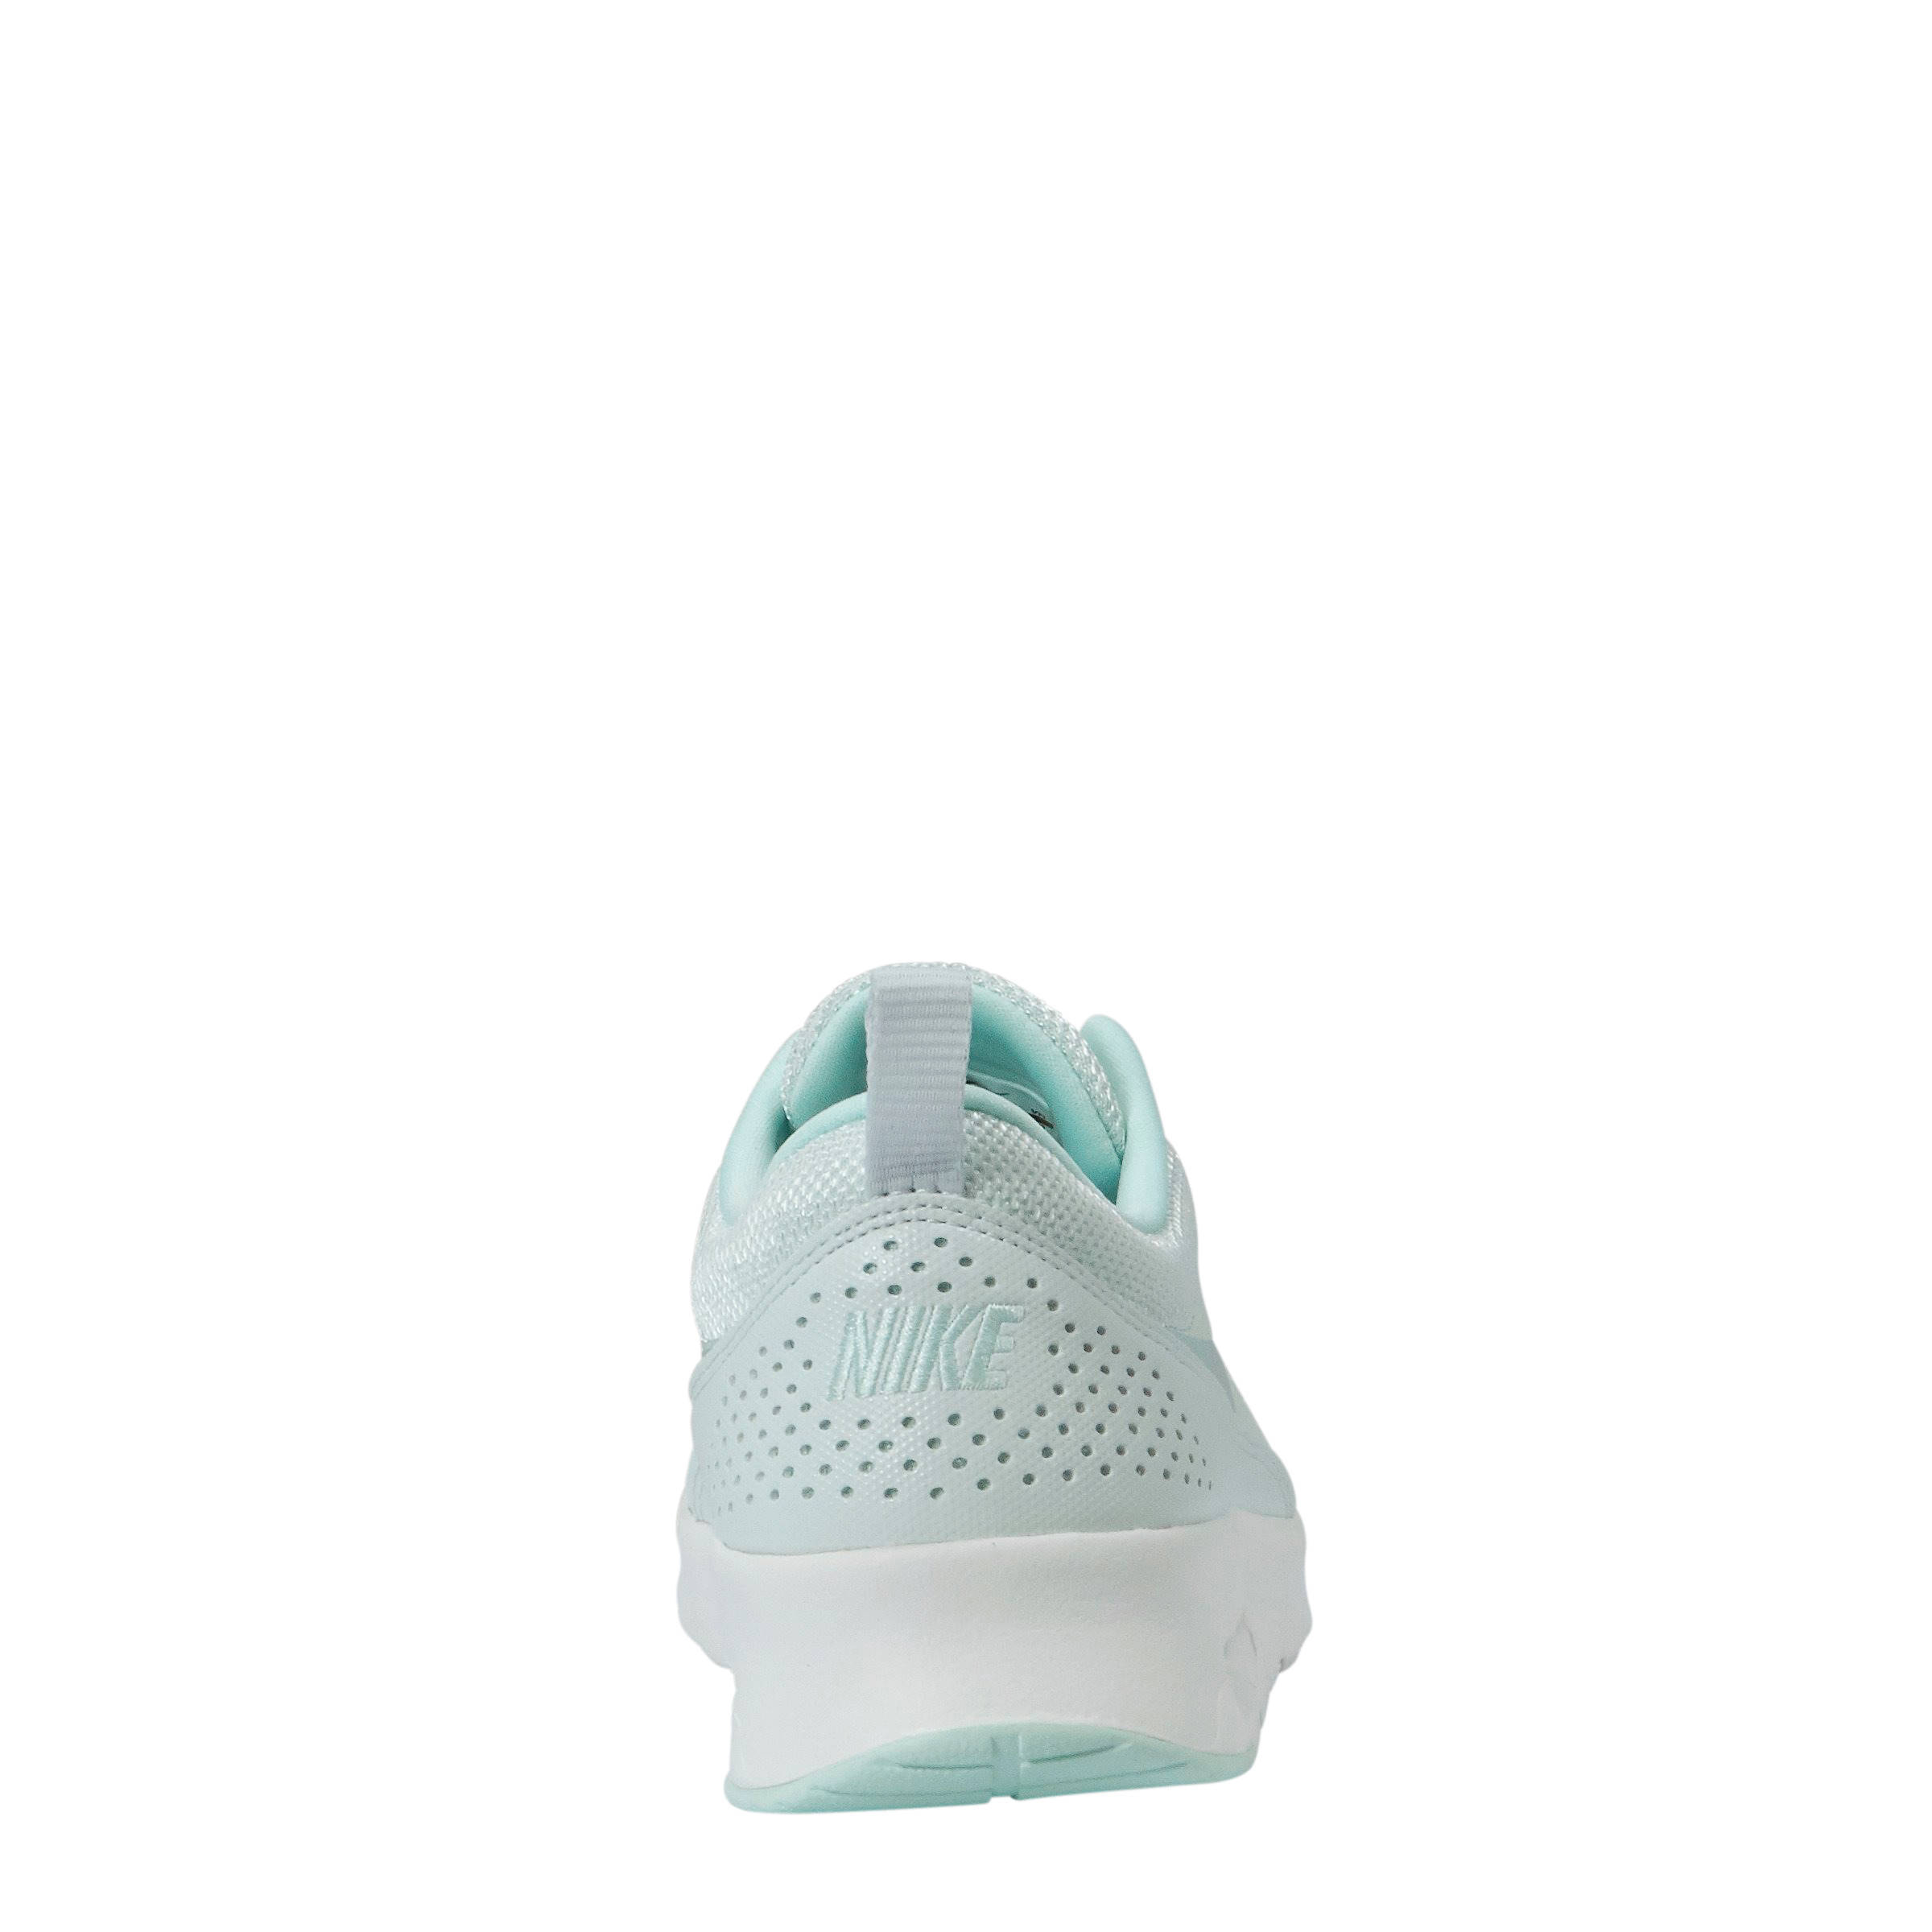 3c4bc835229 nike-air-max-thea-sneakers-mintgroen-mintgroen-0887223374602.jpg